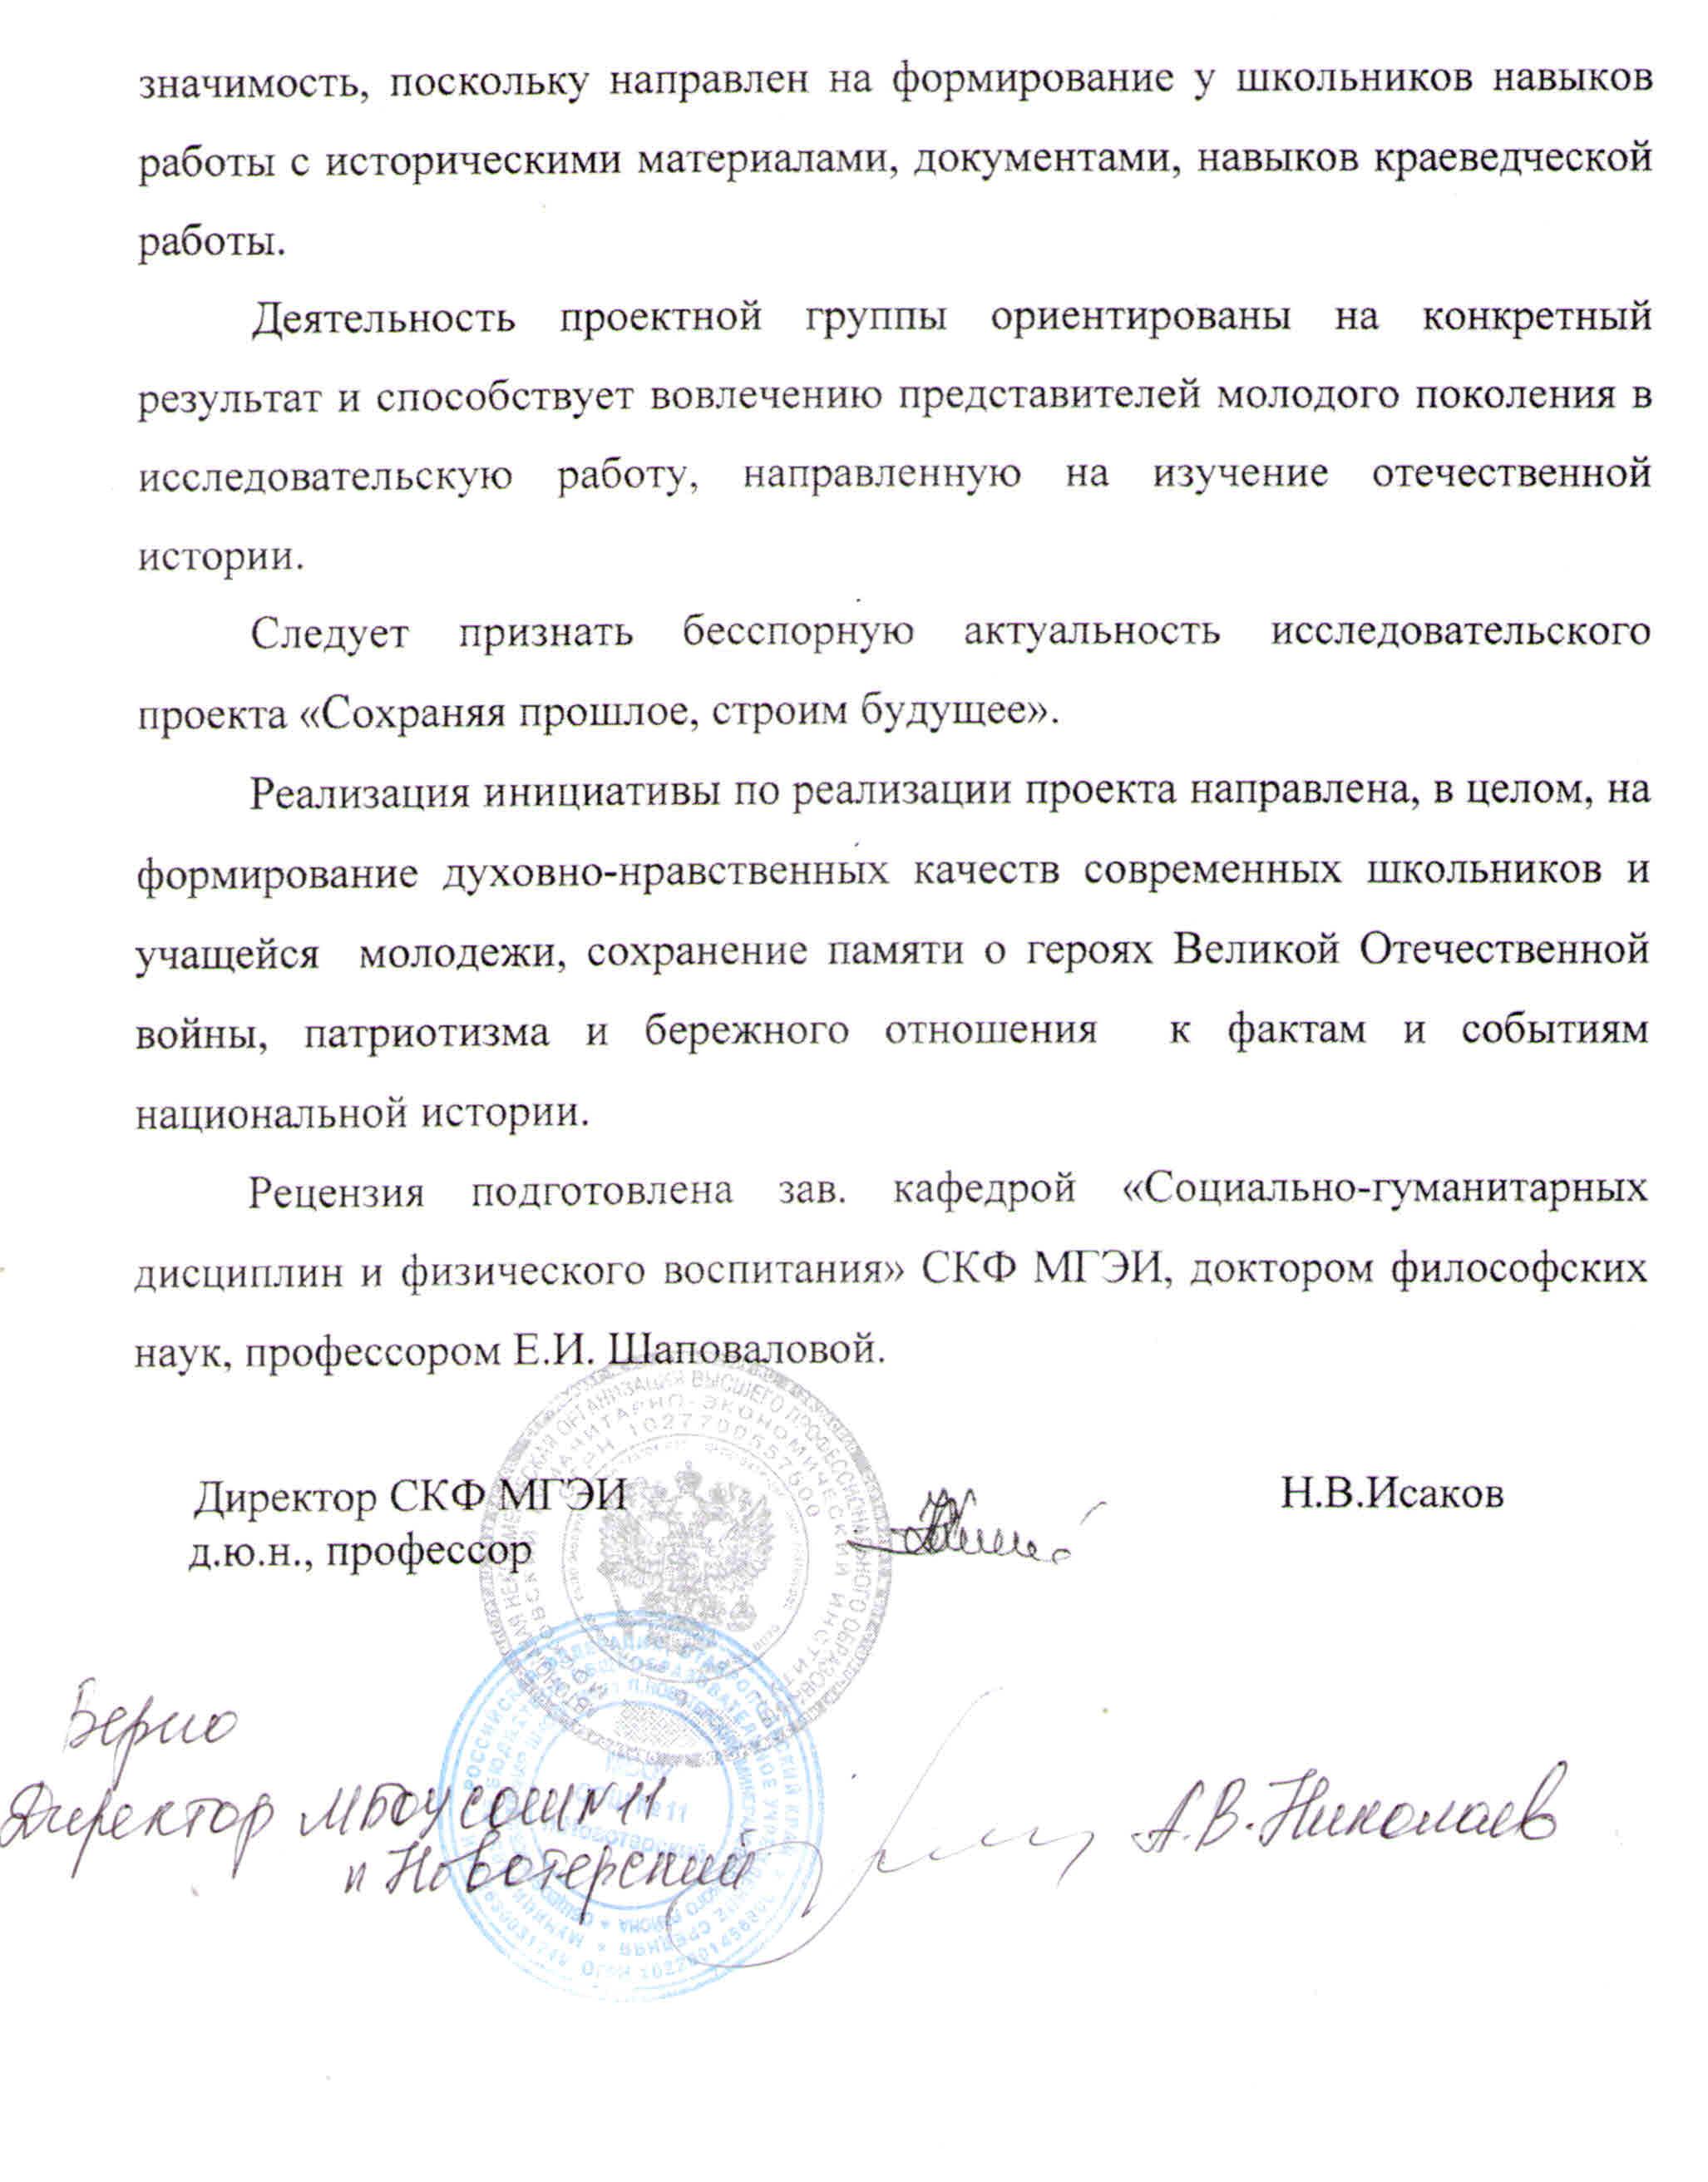 C:\Users\Сергей\Desktop\док-ты\Document_3.jpg